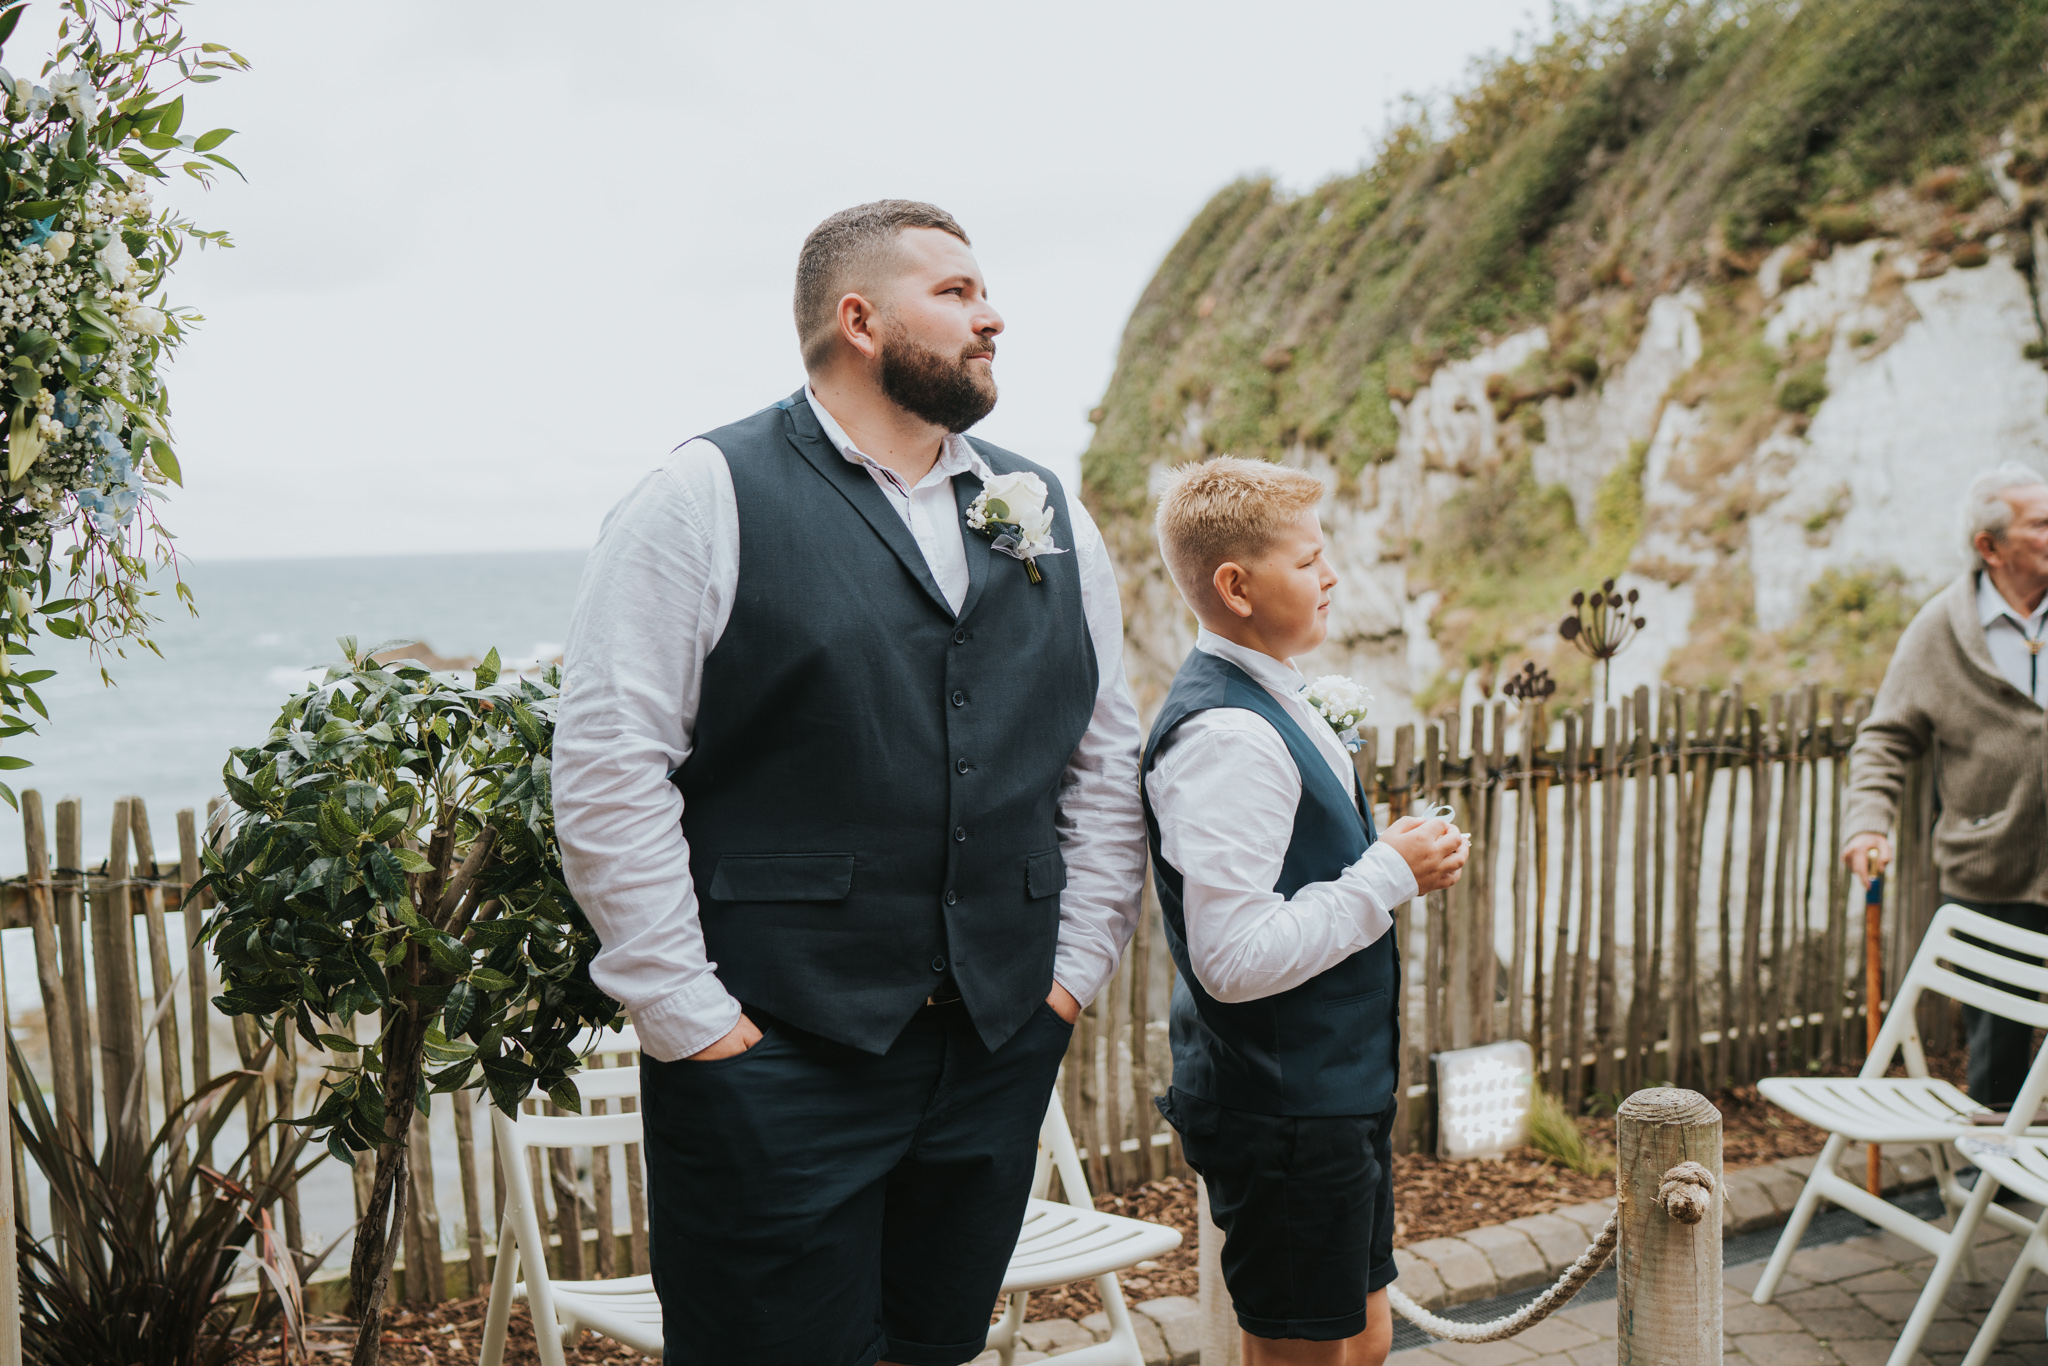 john-amy-relaxed-beach-wedding-tunnels-beaches-ilfracombe-north-devon-grace-elizabeth-colchester-essex-alternative-relaxed-wedding-photography-devon-suffolk-norfolk-essex (47 of 159).jpg